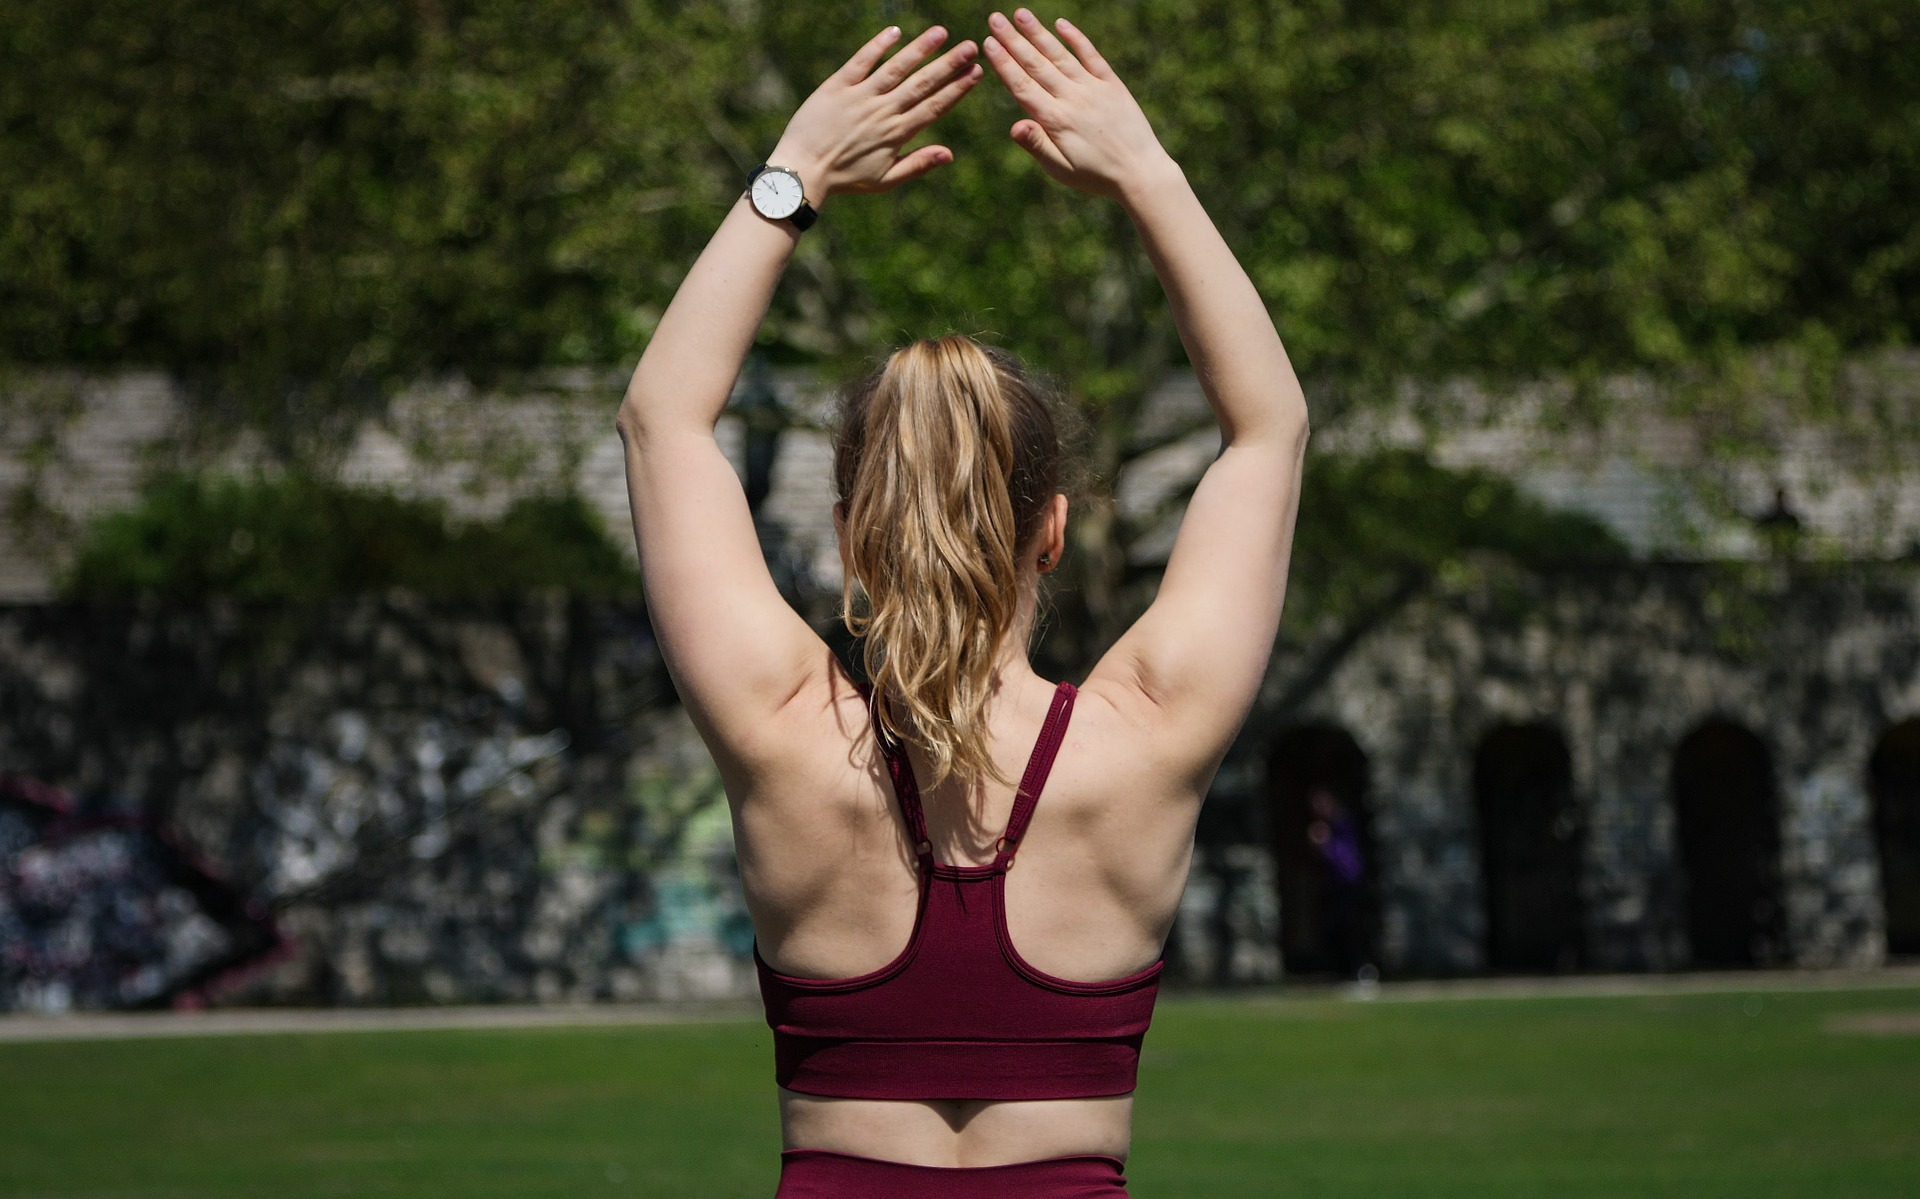 Fitnessgerät Bauch